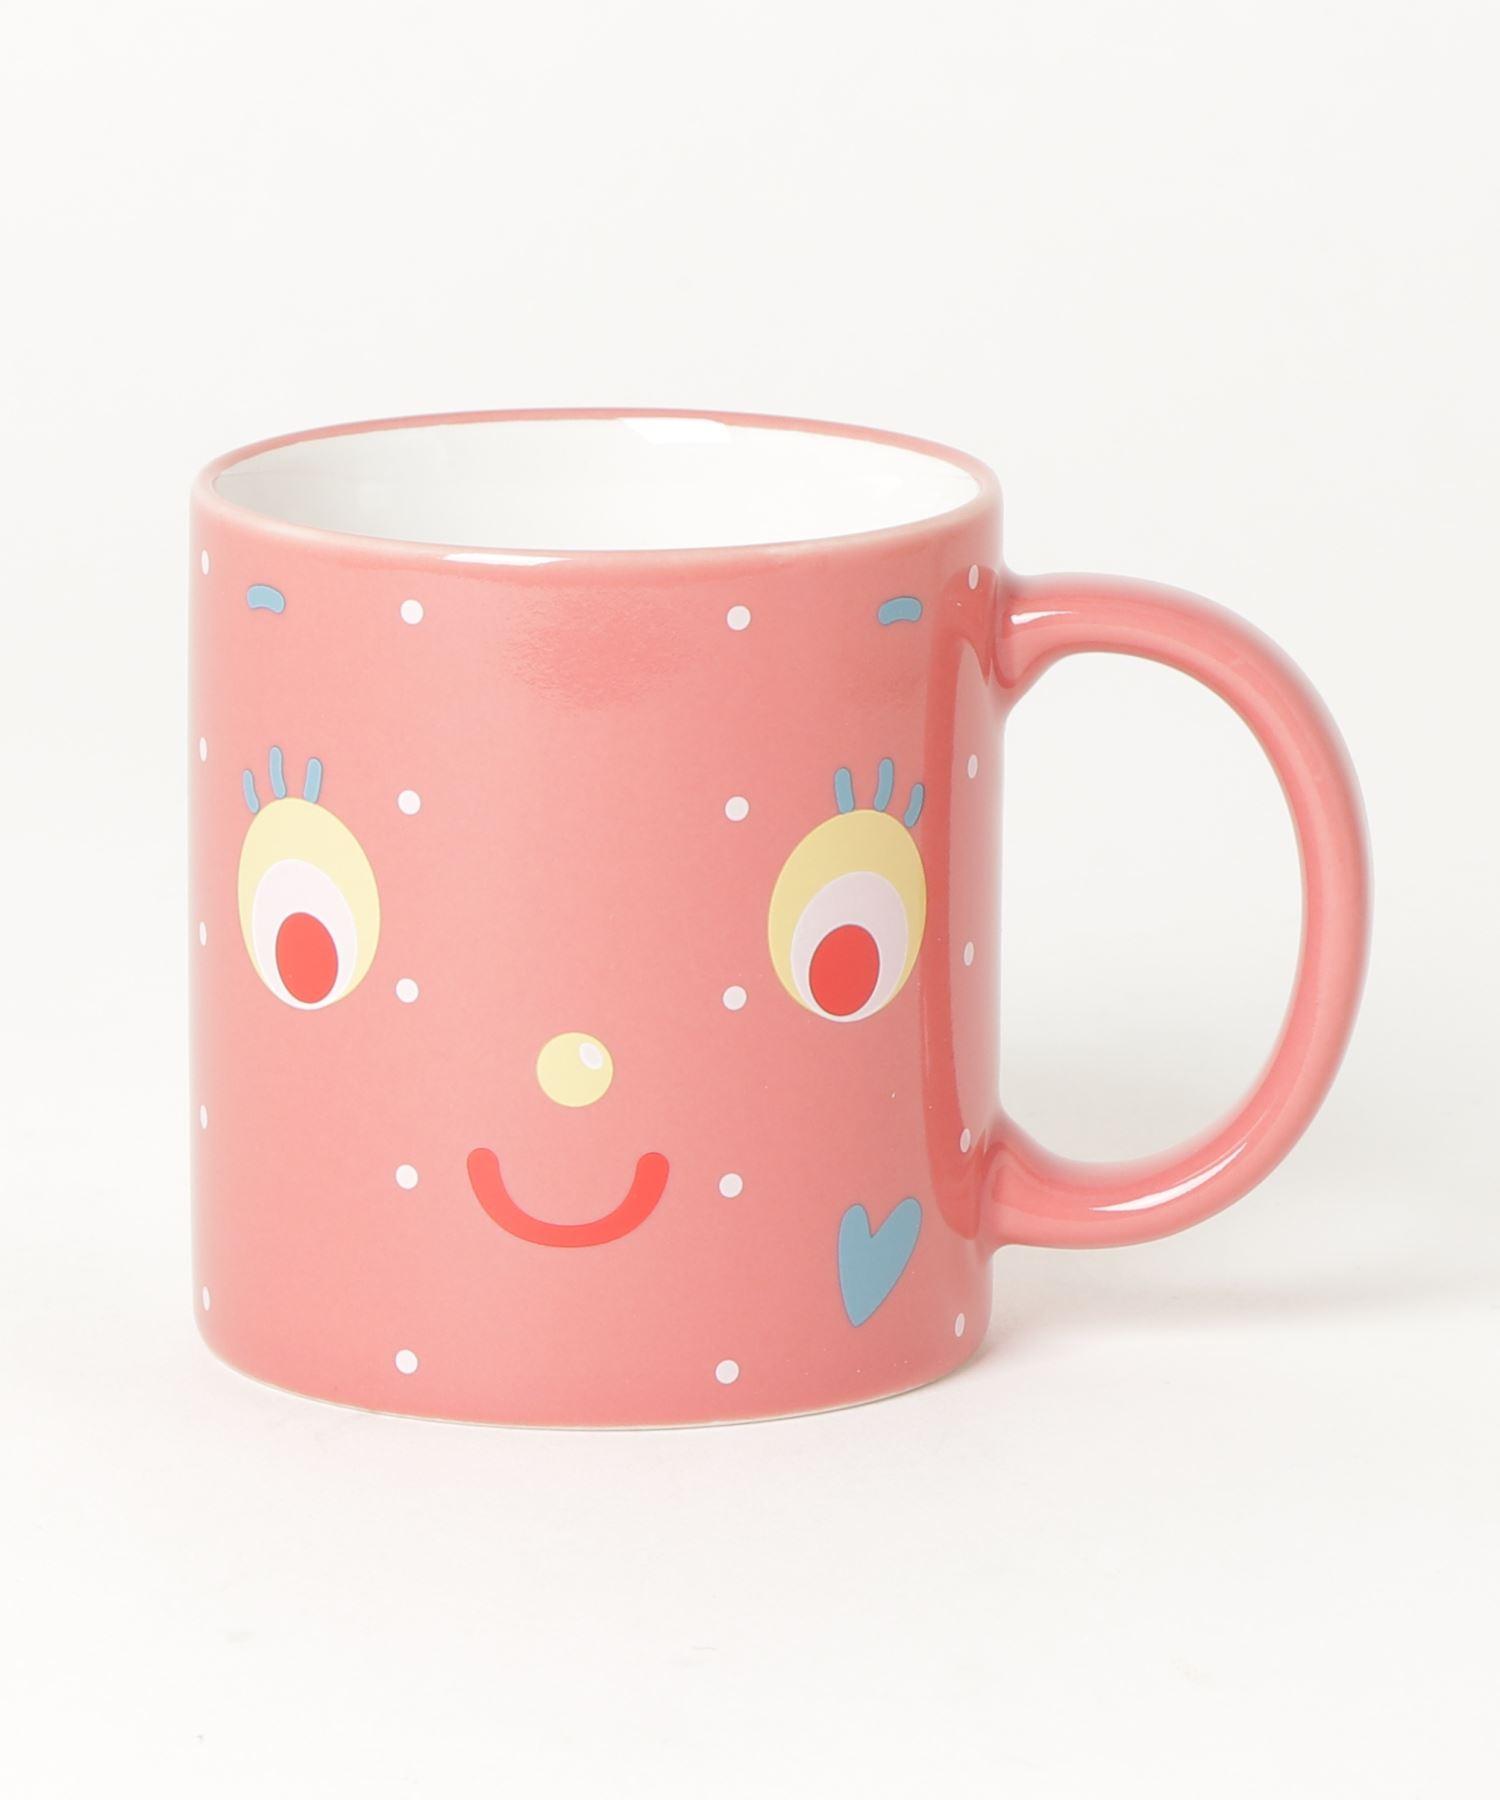 CREAM SODA マグカップ